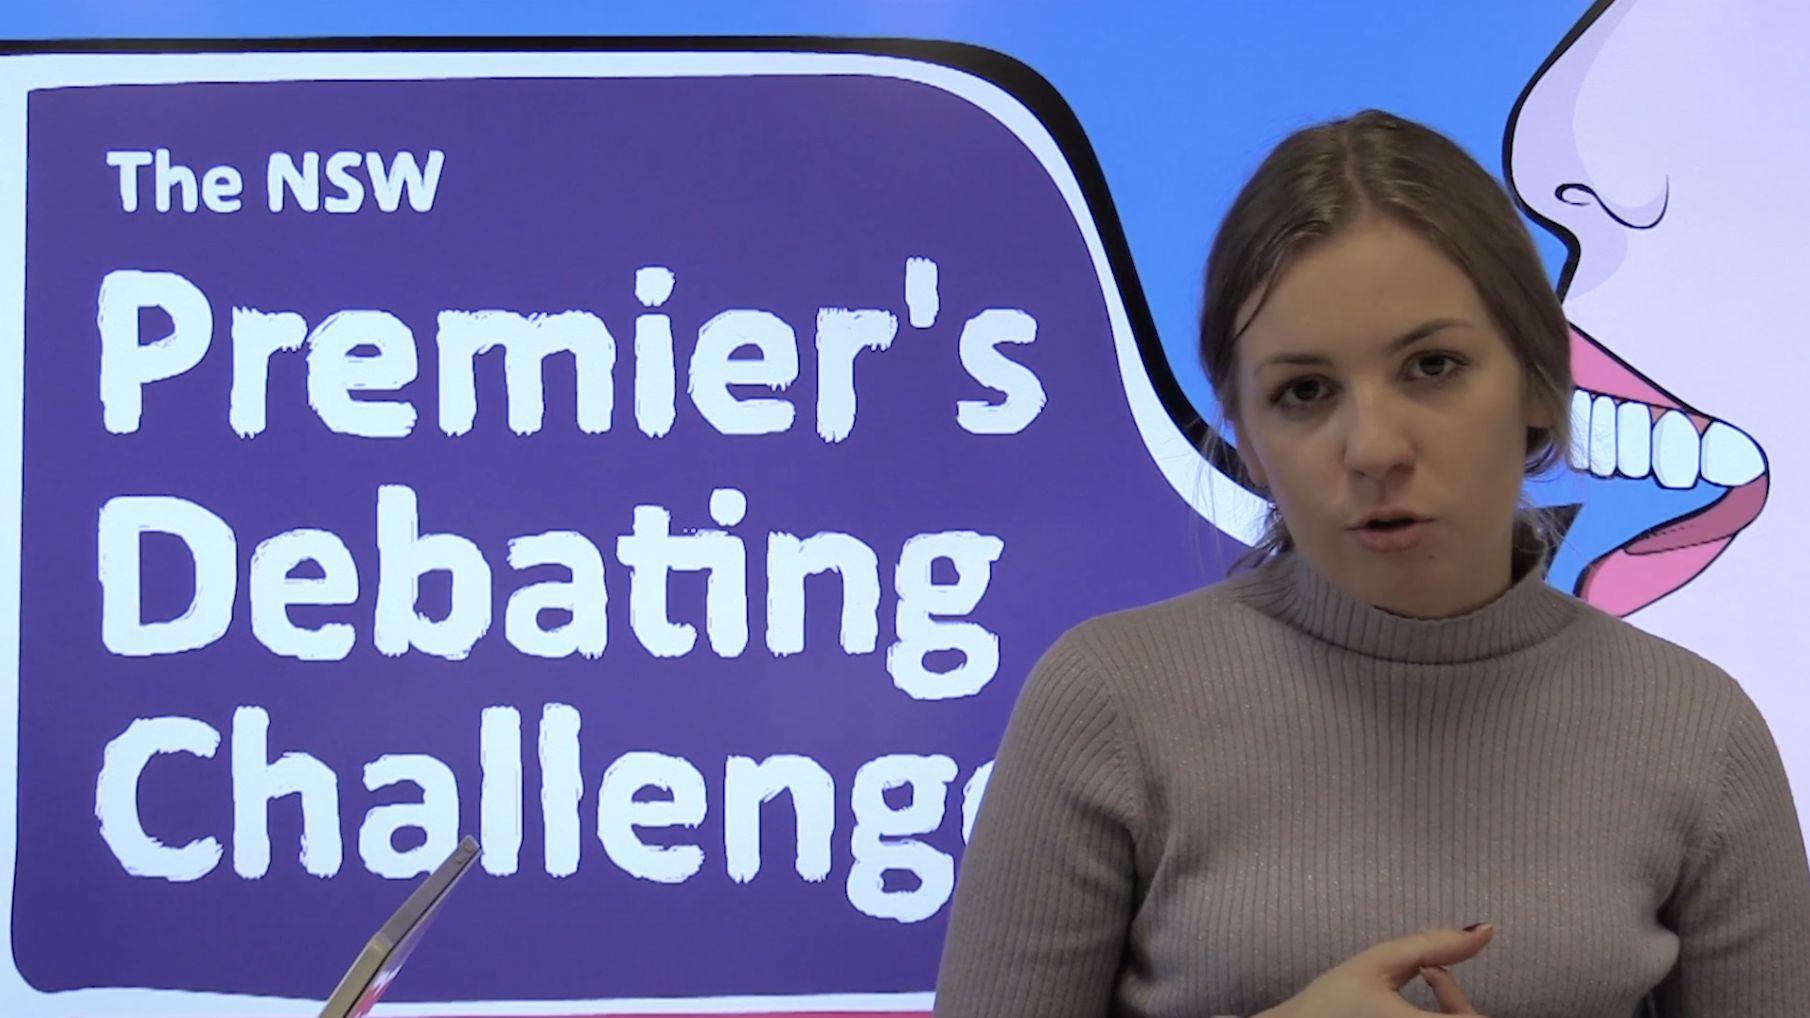 Defining a primary school debating topic – 9. with Elinor Stephenson